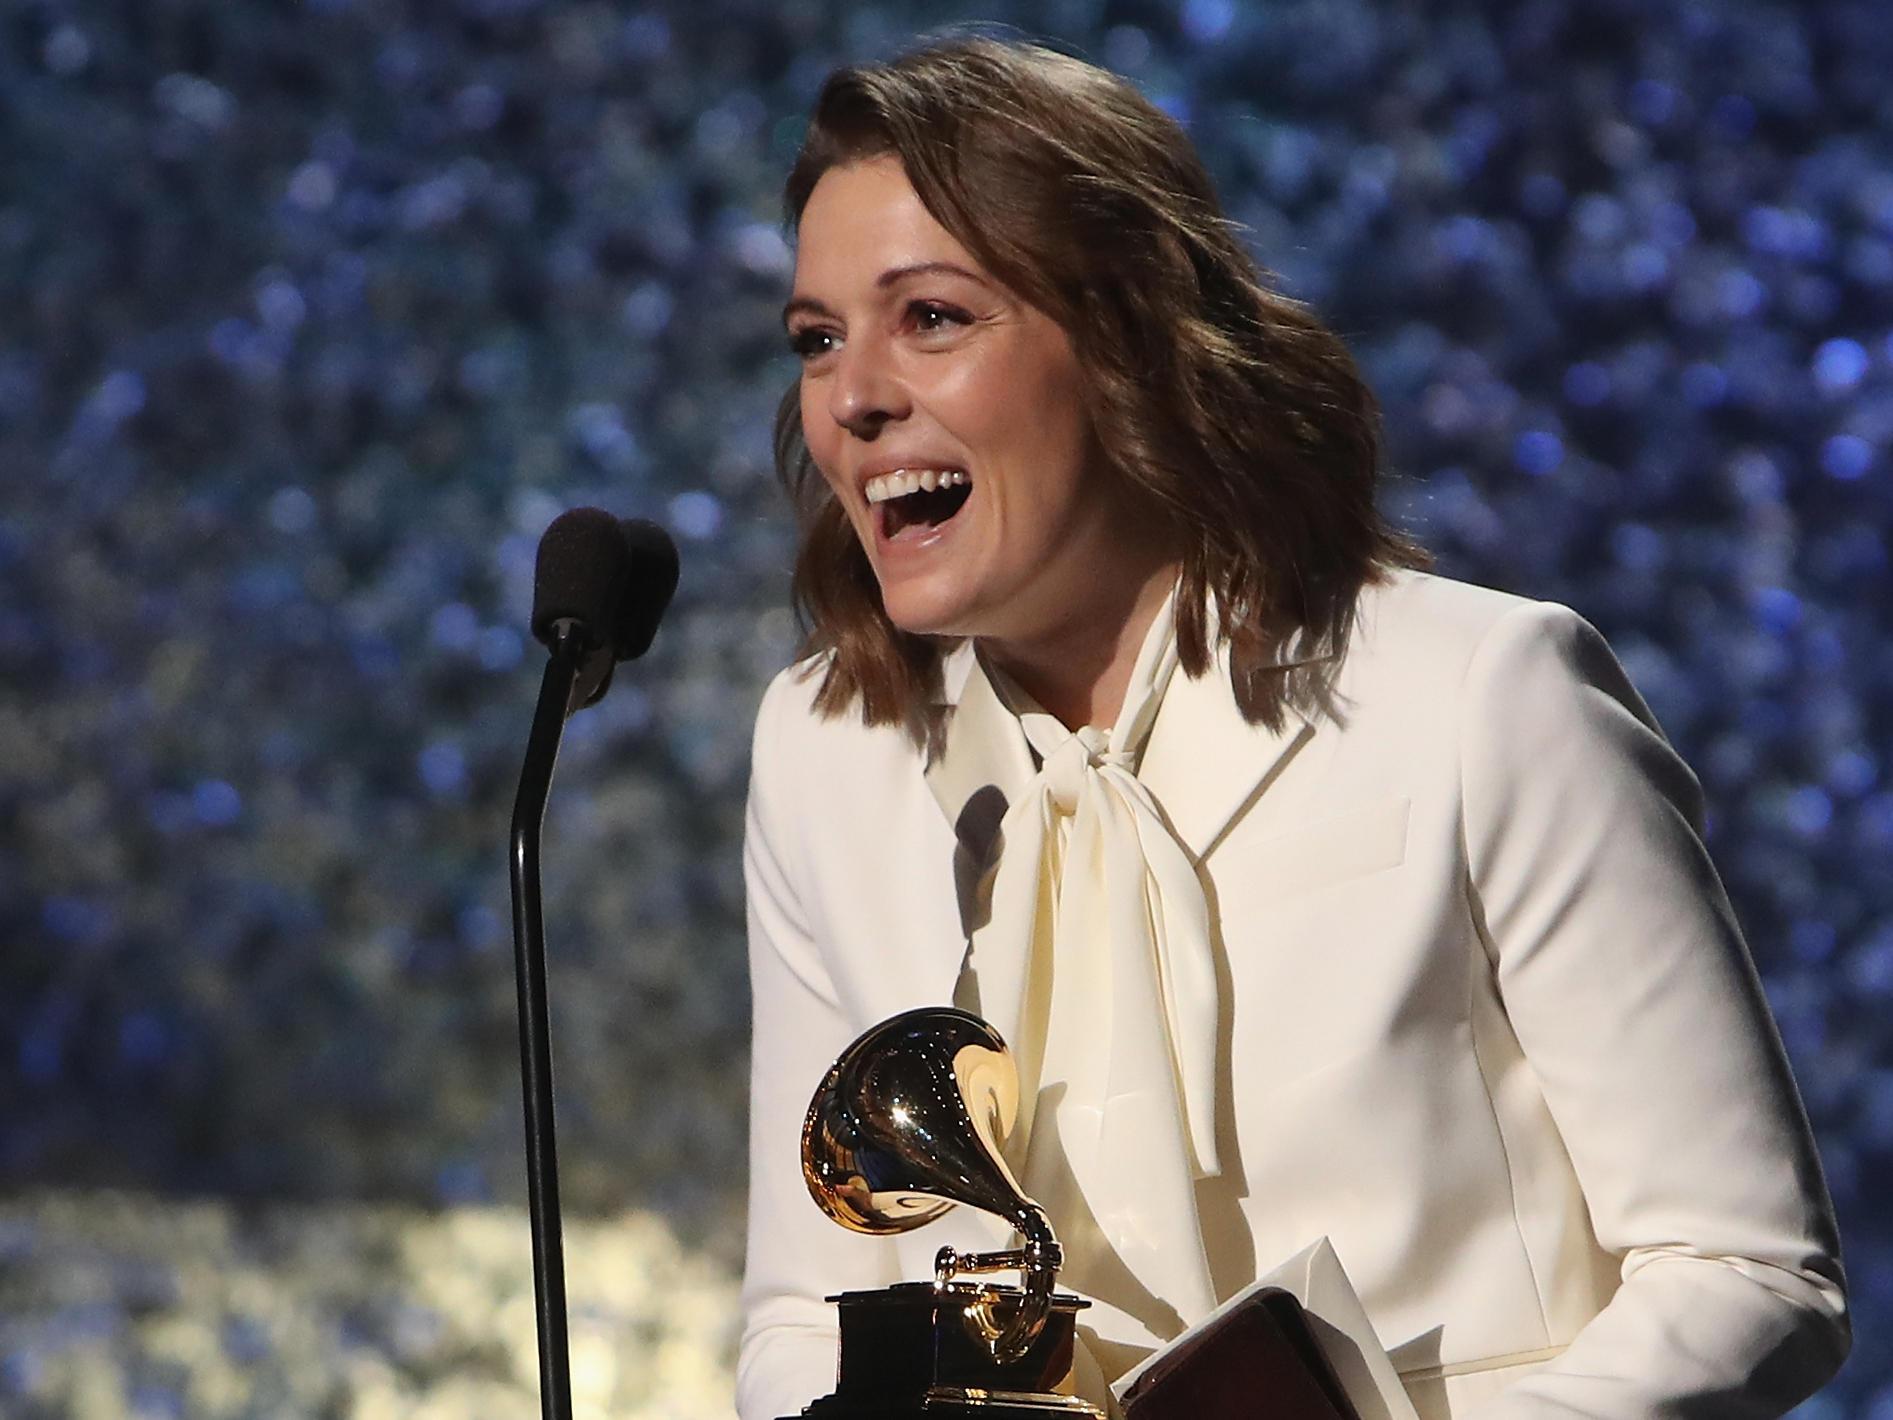 2019 Grammy Awards: The Full List Of Winners | Maine Public